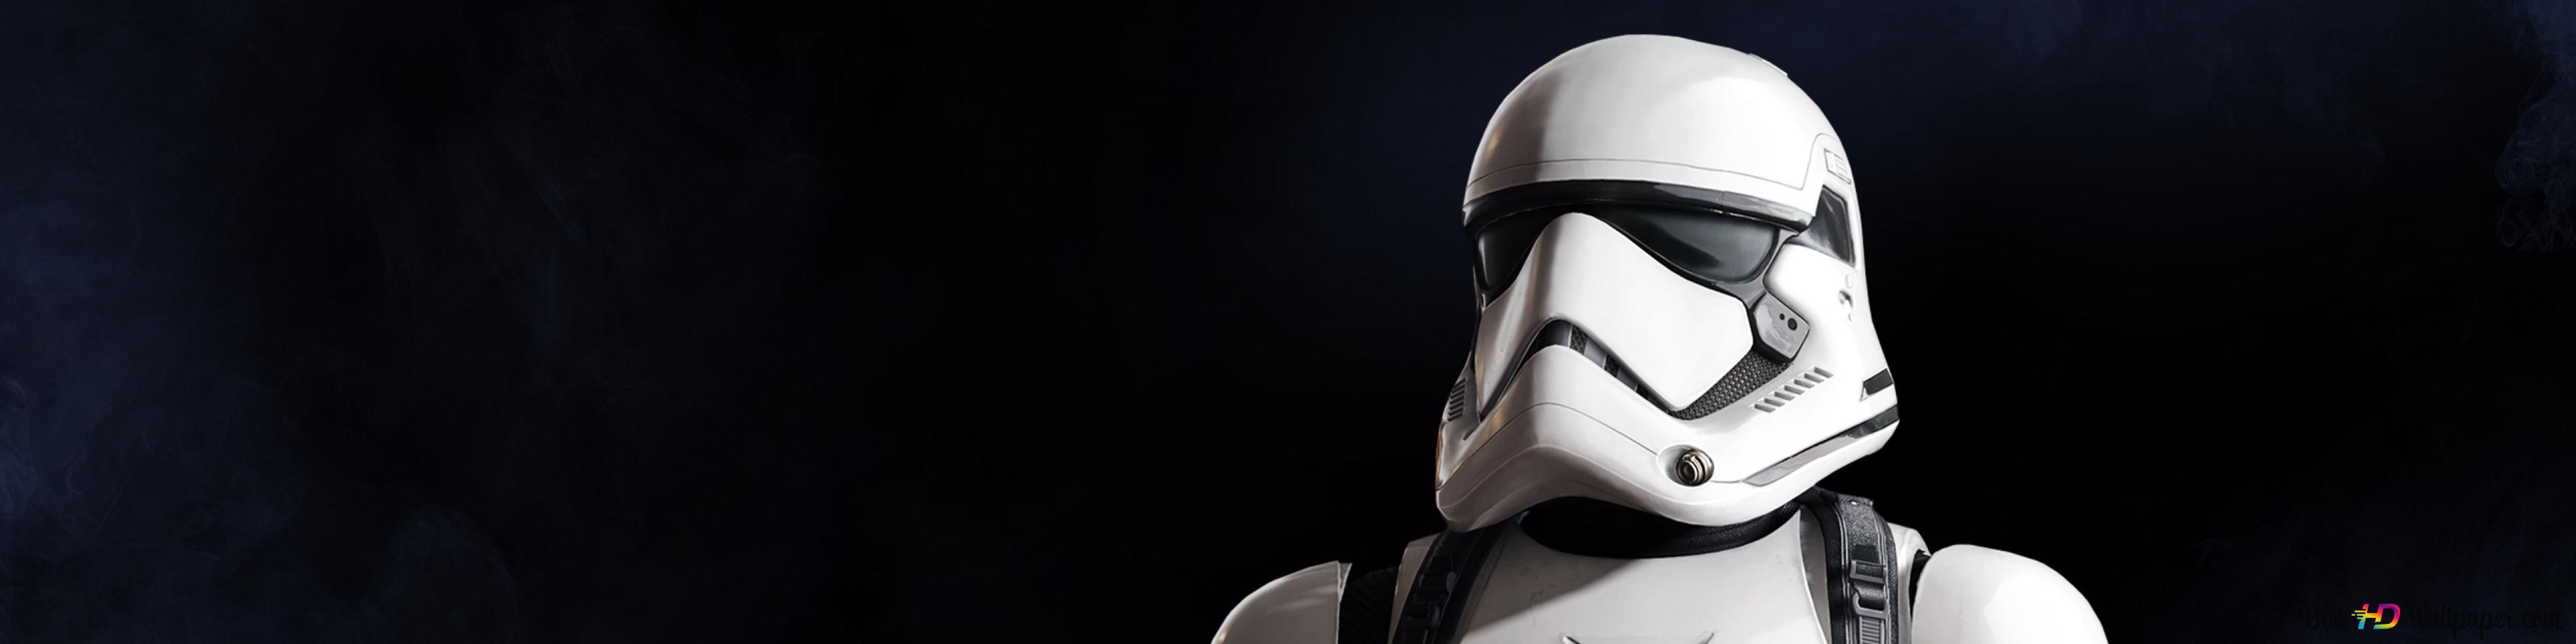 Star Wars Battlefront 2 Game Stormtrooper Hd Wallpaper Download